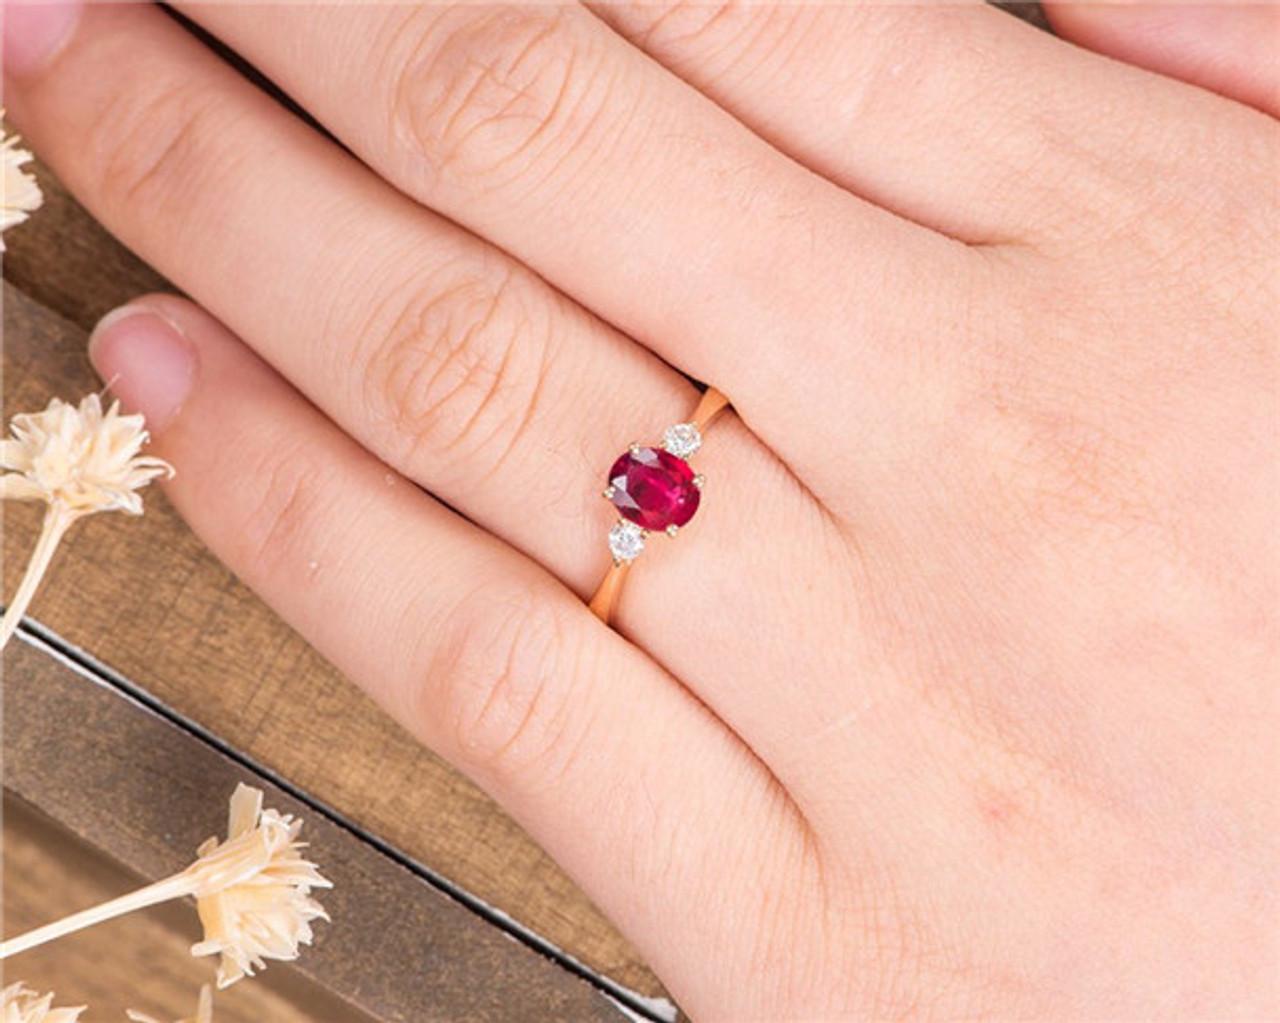 Ruby Wedding Rings.Rose Gold Engagement Ring Lab Ruby Diamond Wedding Half Eternity Birthstone July Anniversary Gift